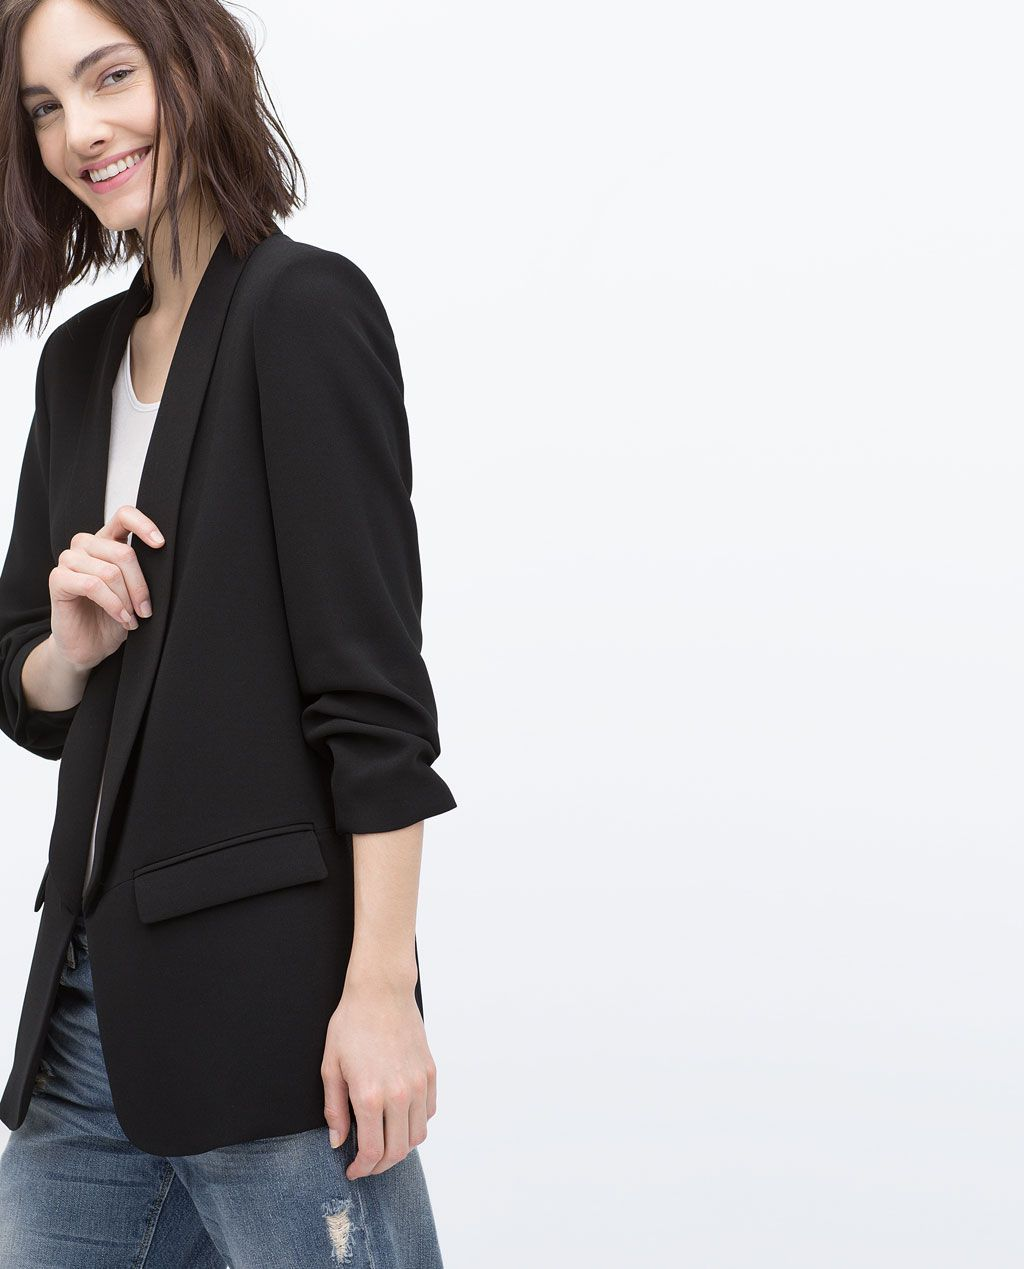 67f6a79227 CREPE BLAZER-Outerwear-WOMAN-COLLECTION AW15 | ZARA Finland | Mode ...